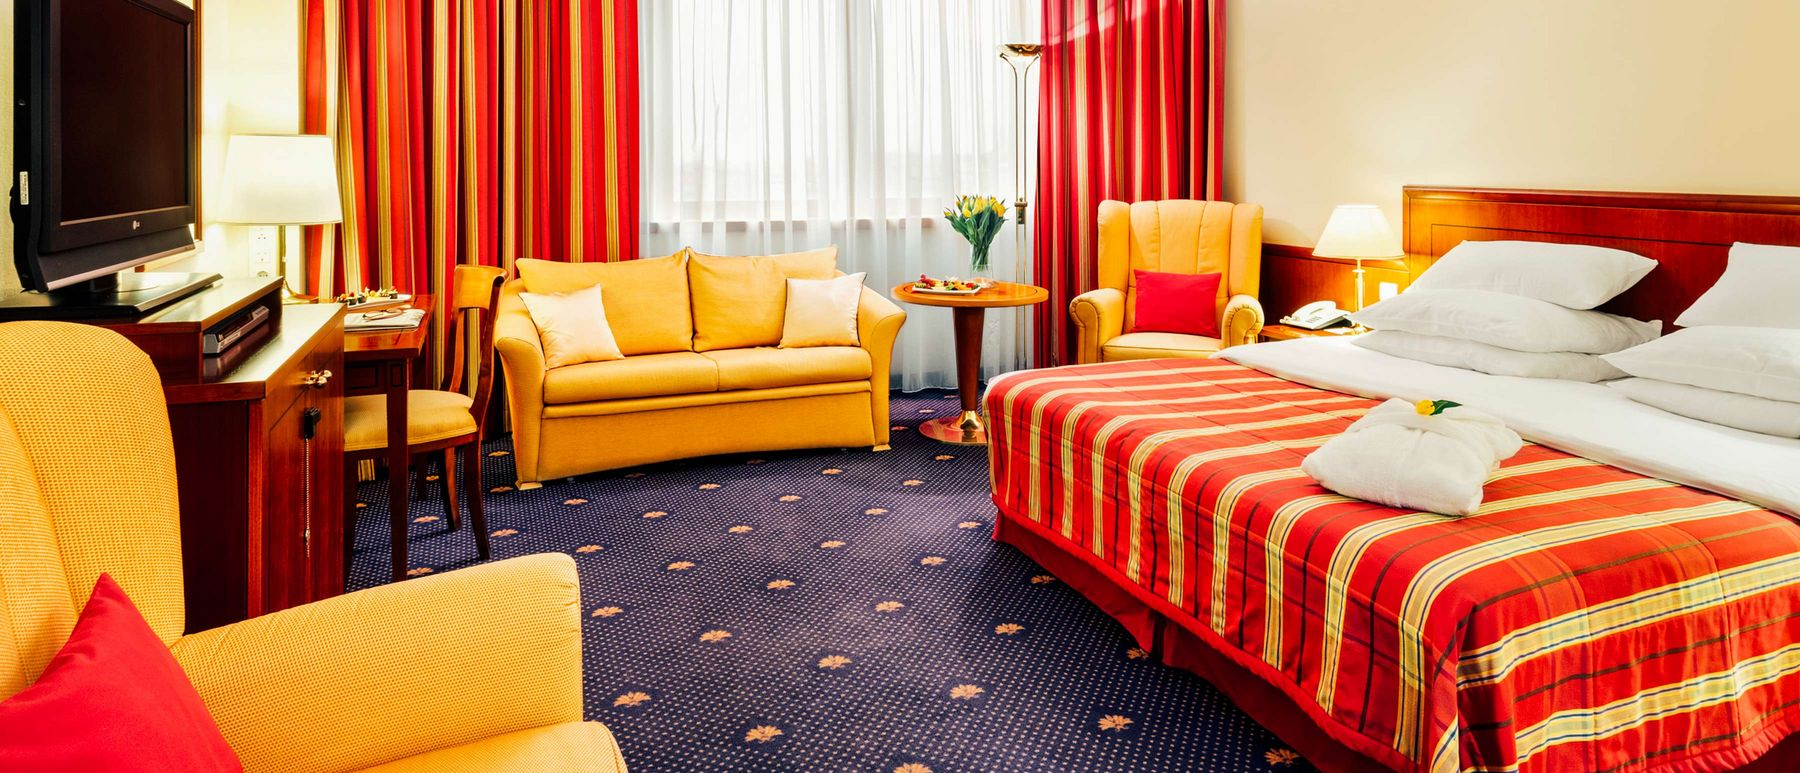 Hotel Vienna House Diplomat fotografie 3